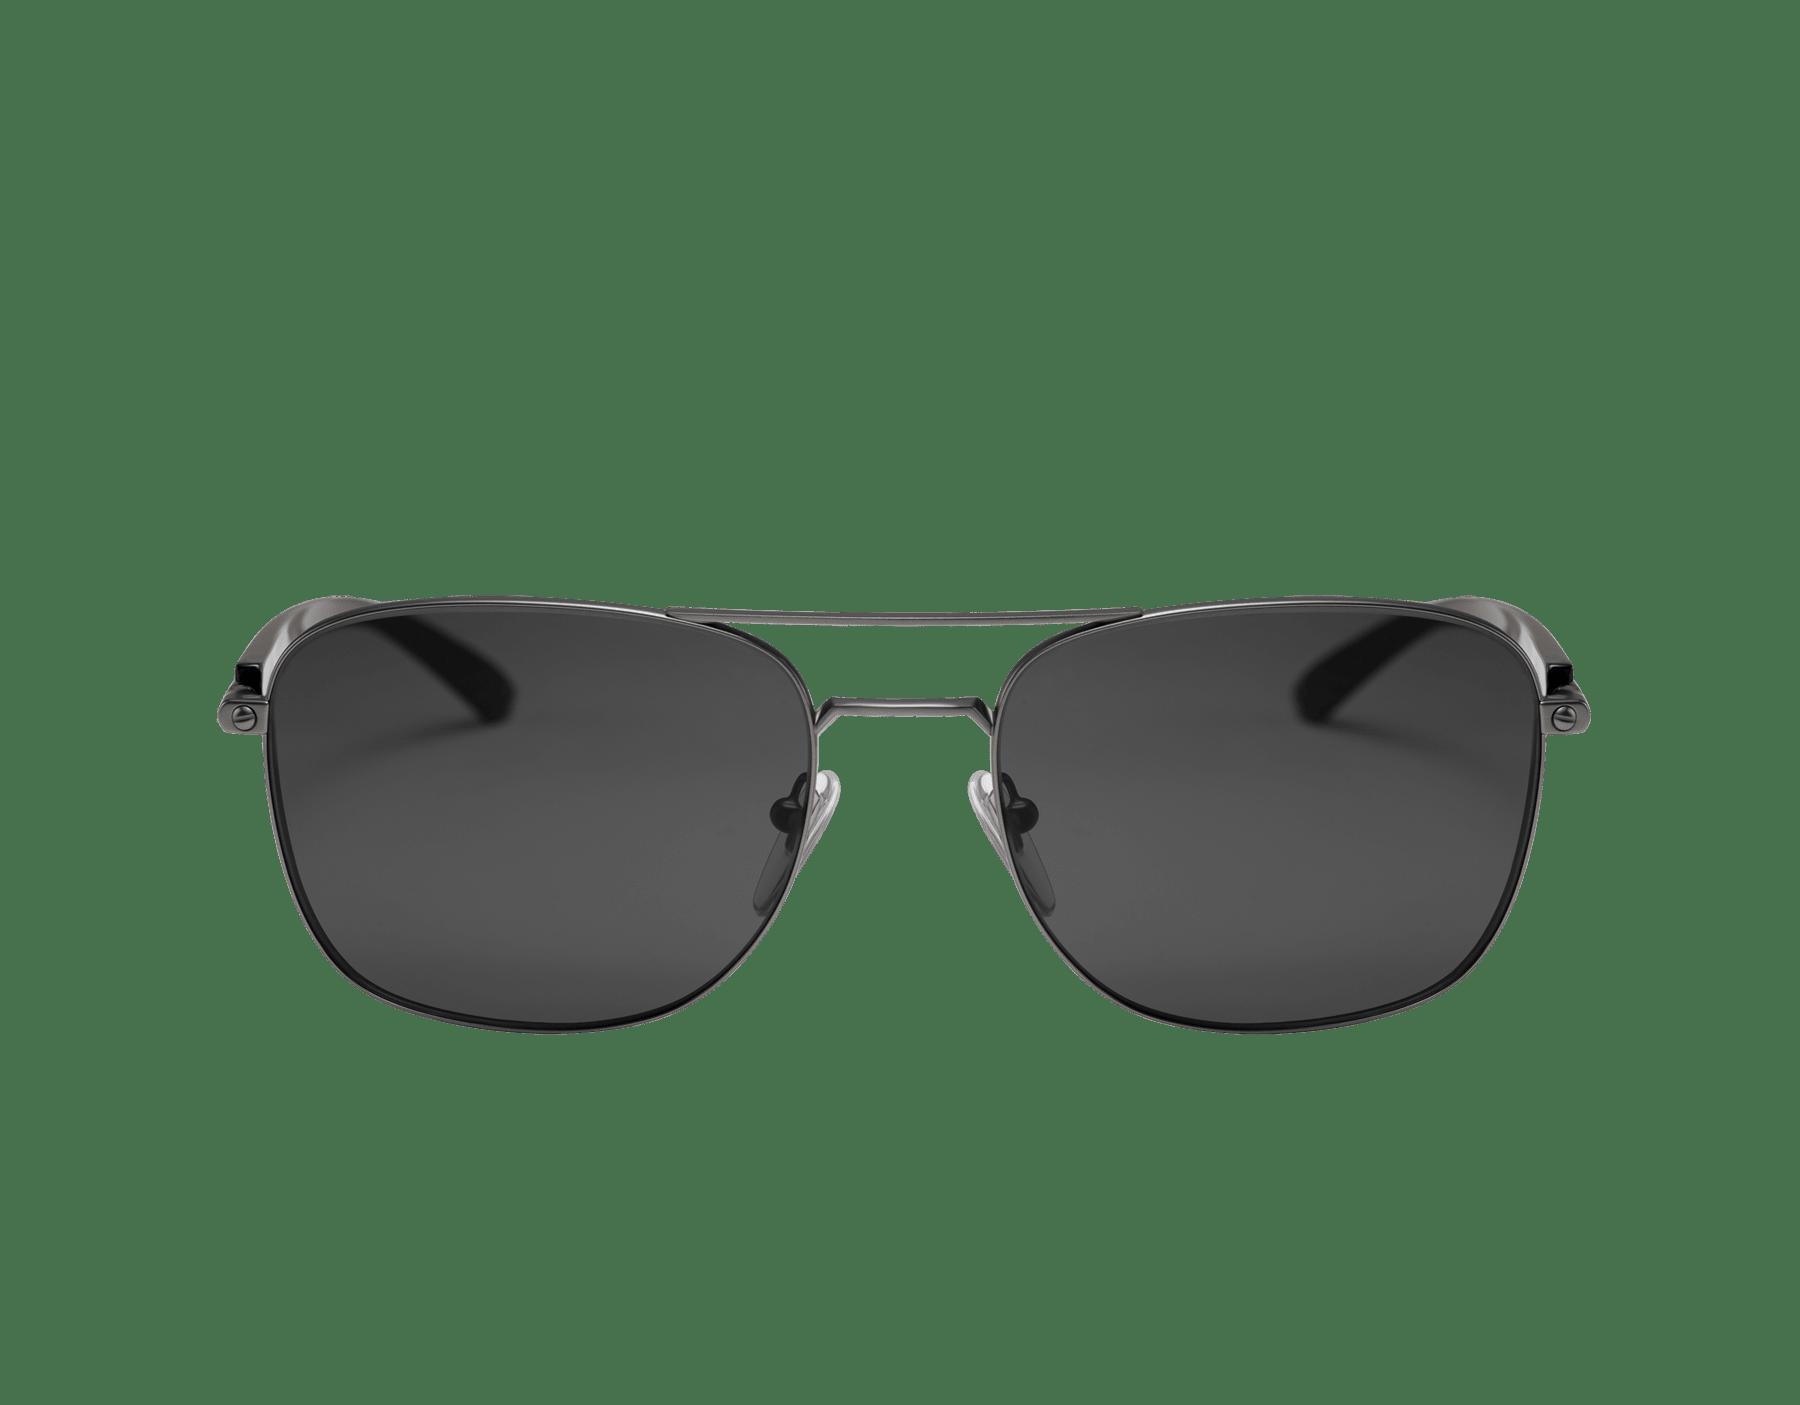 Bulgari Diagono rectangular metal sunglasses with metal double bridge and carbon fibre arms. 903911 image 2